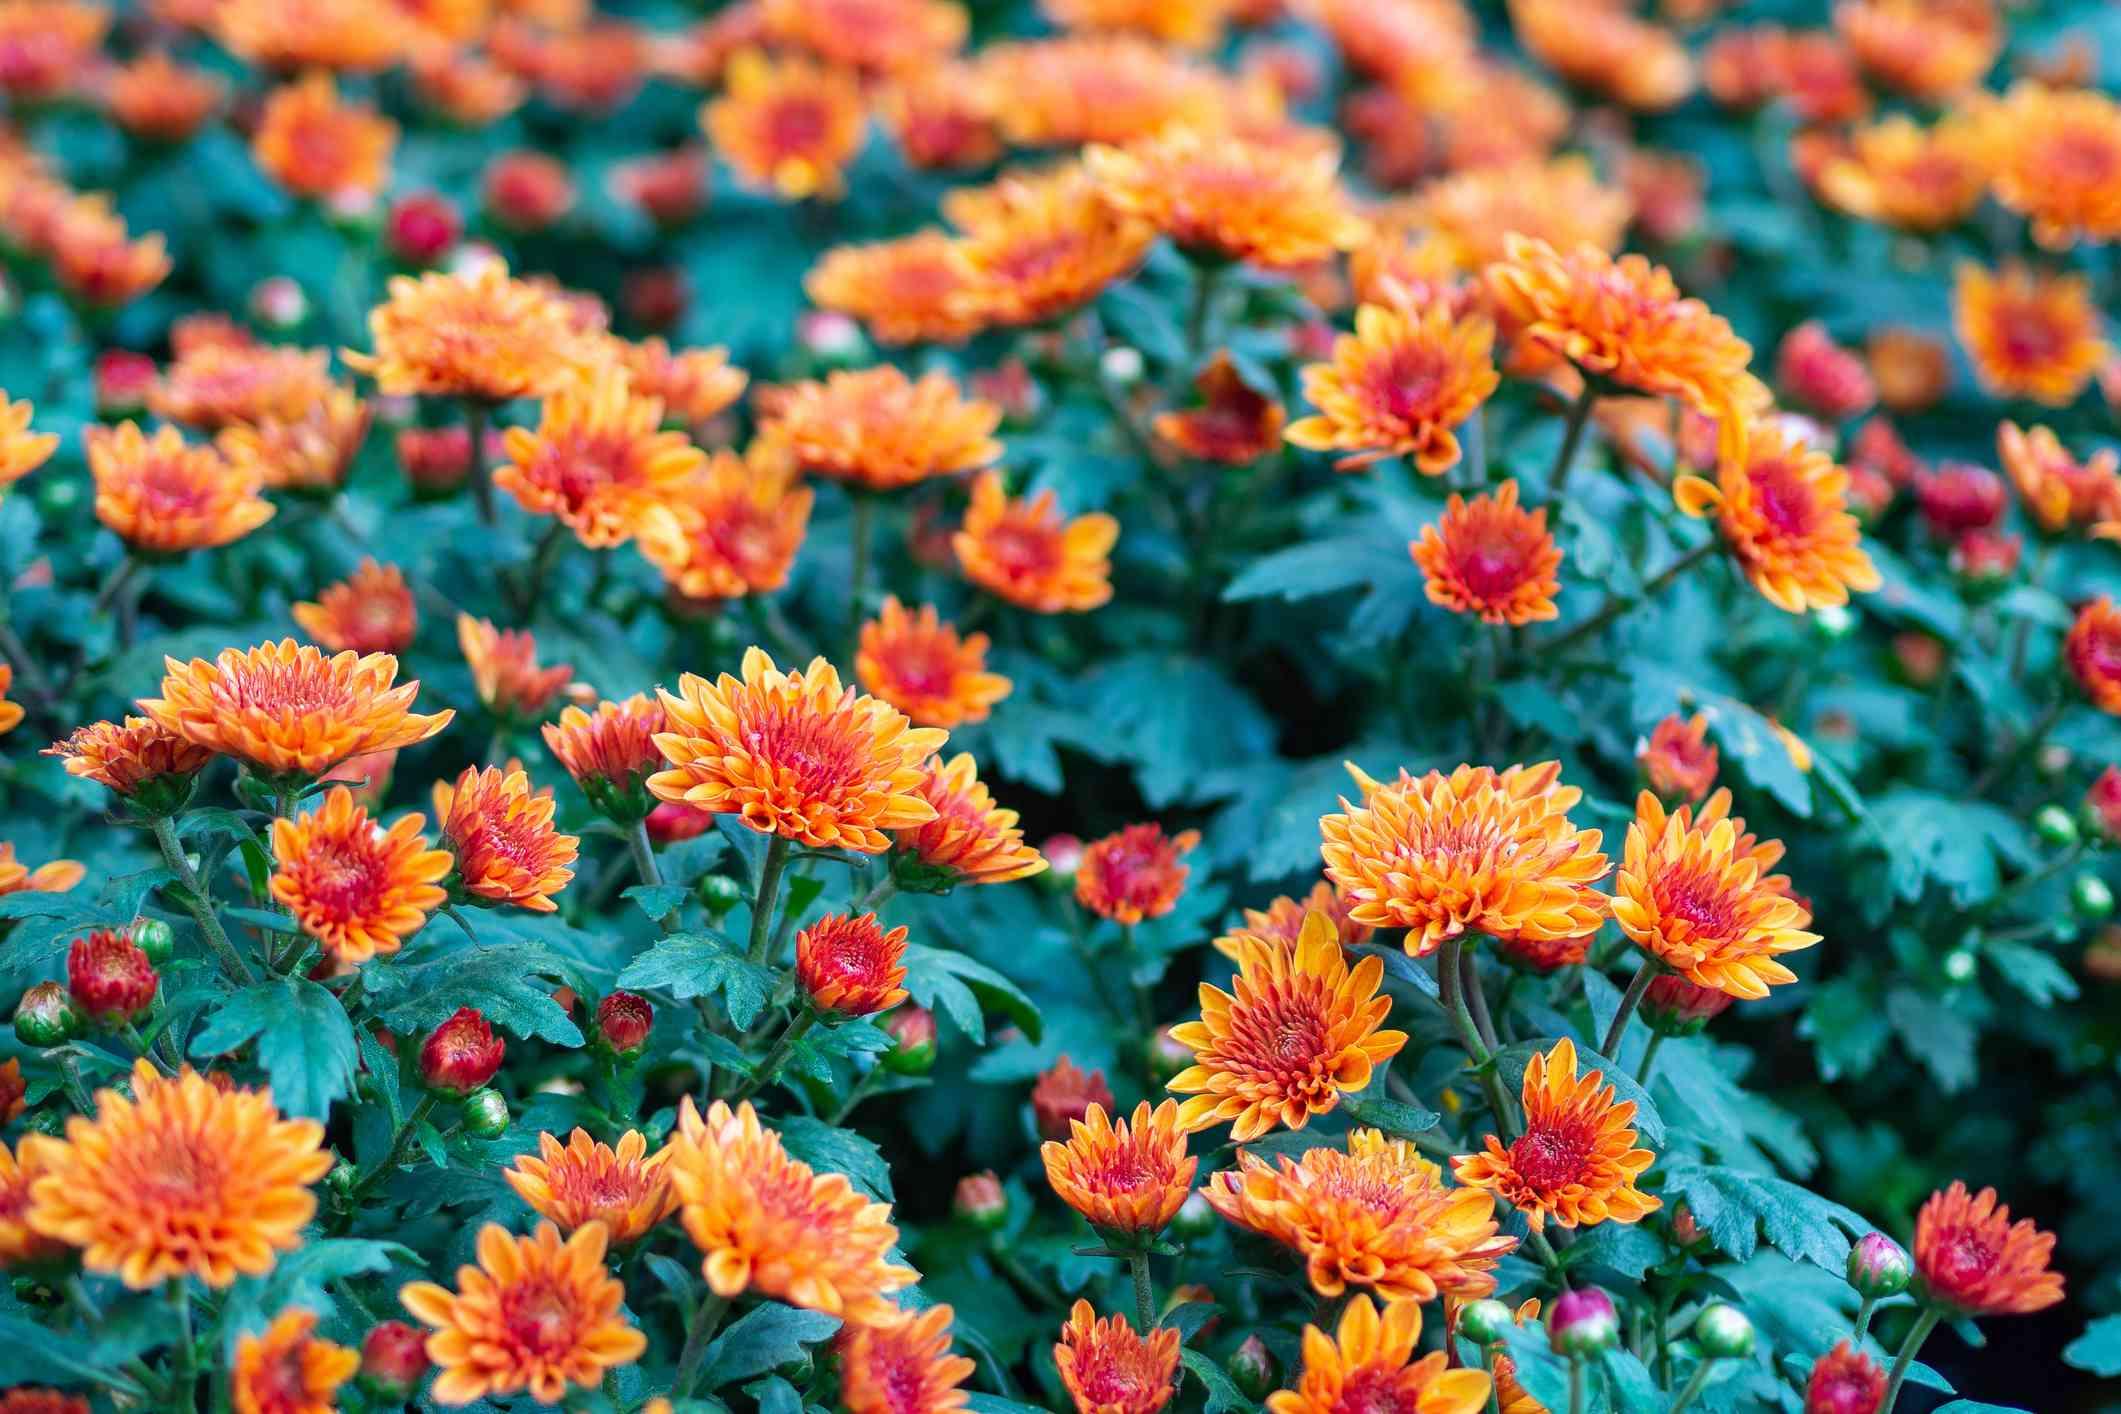 Close up of Chrysanthemum flowers